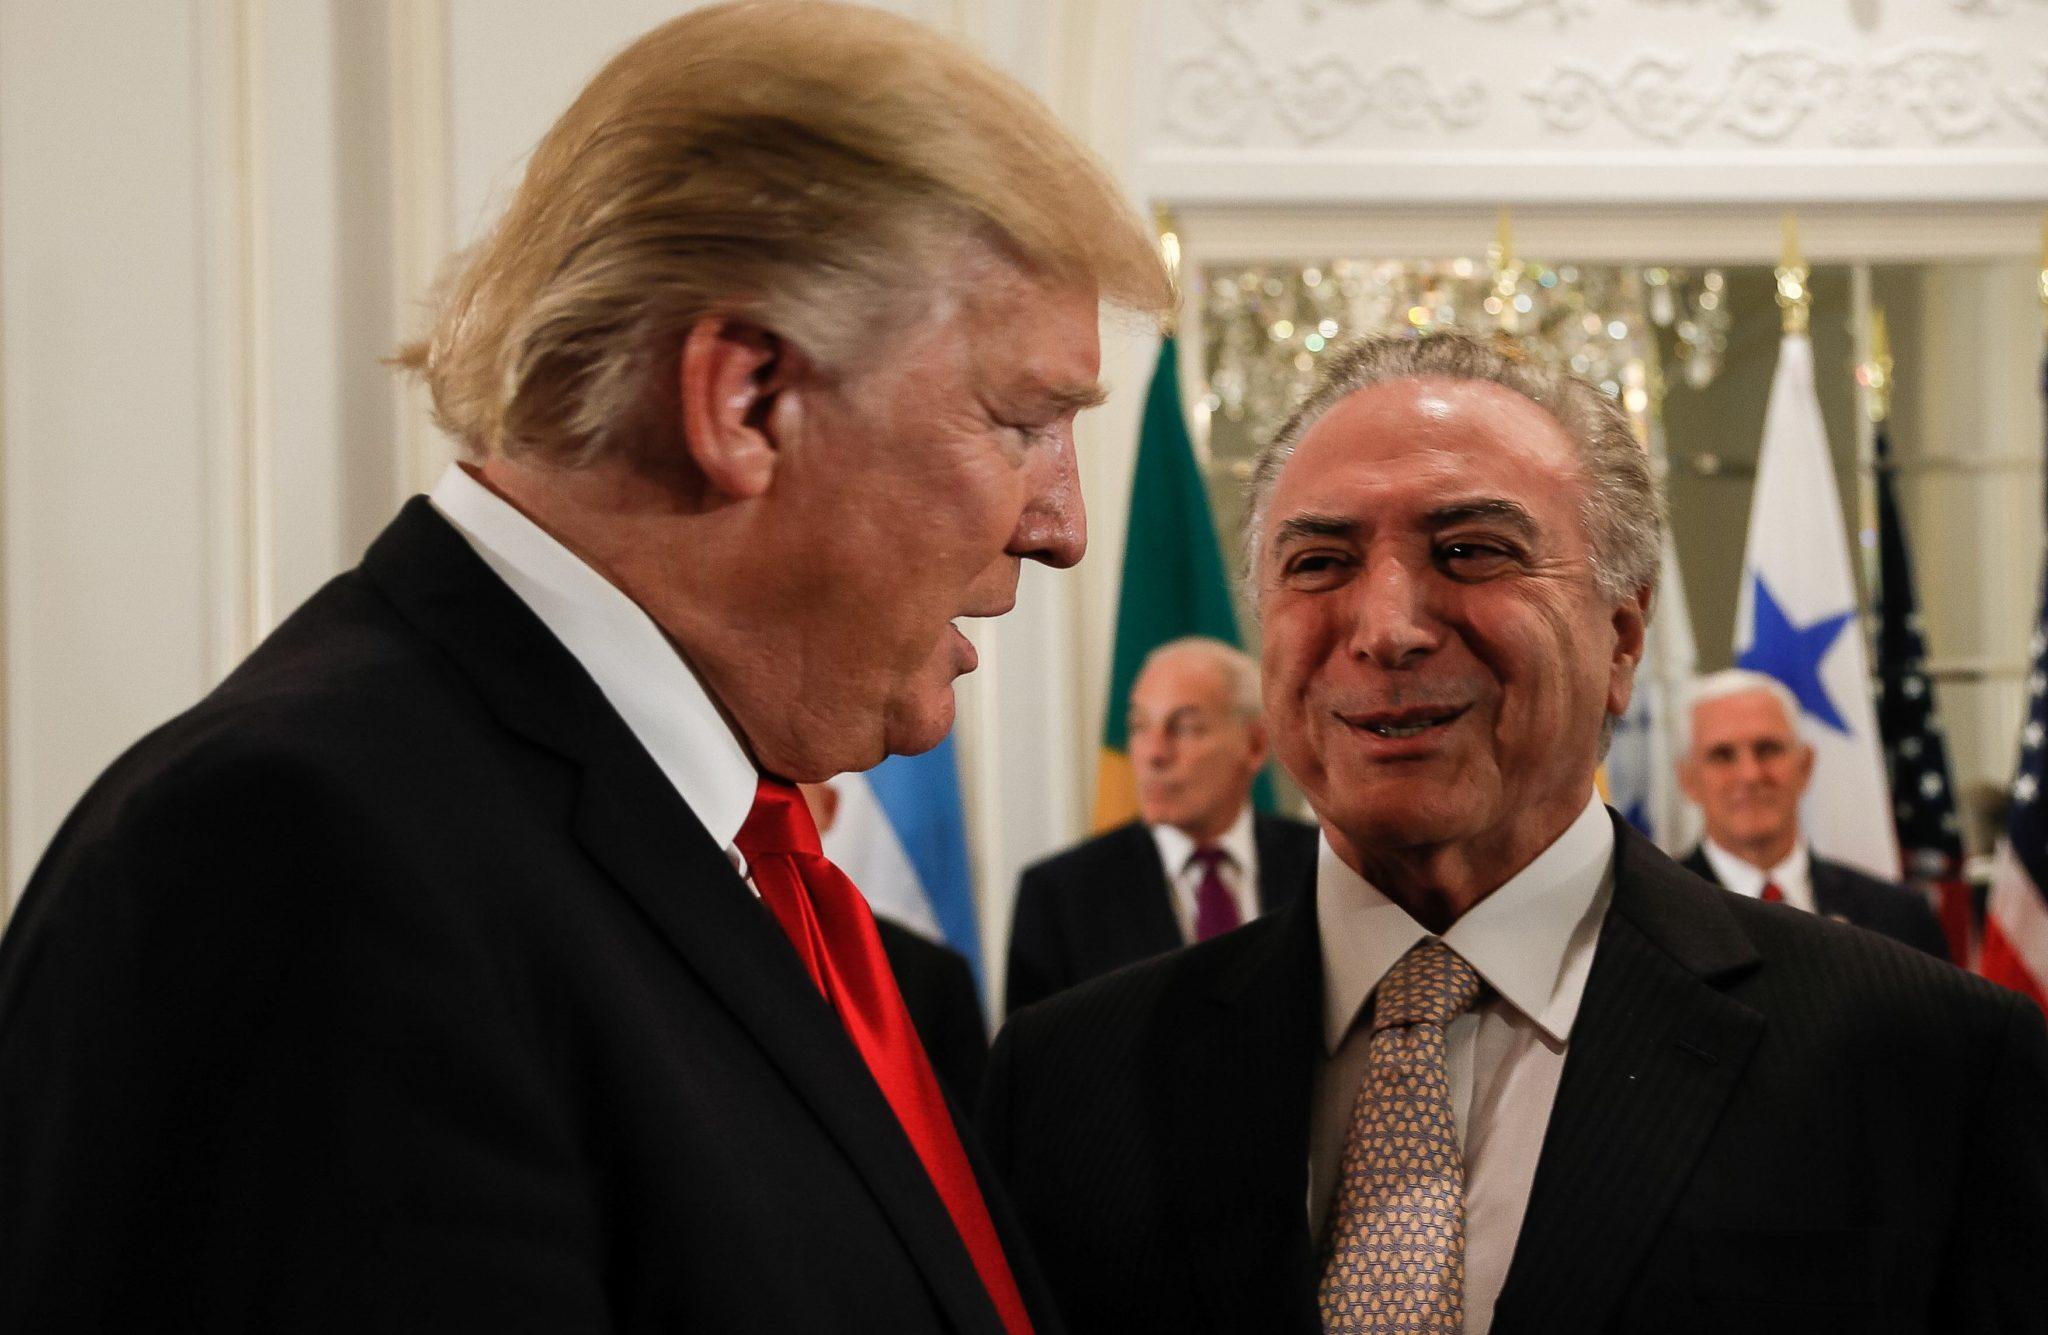 Trump's tax reform Brazil's economy